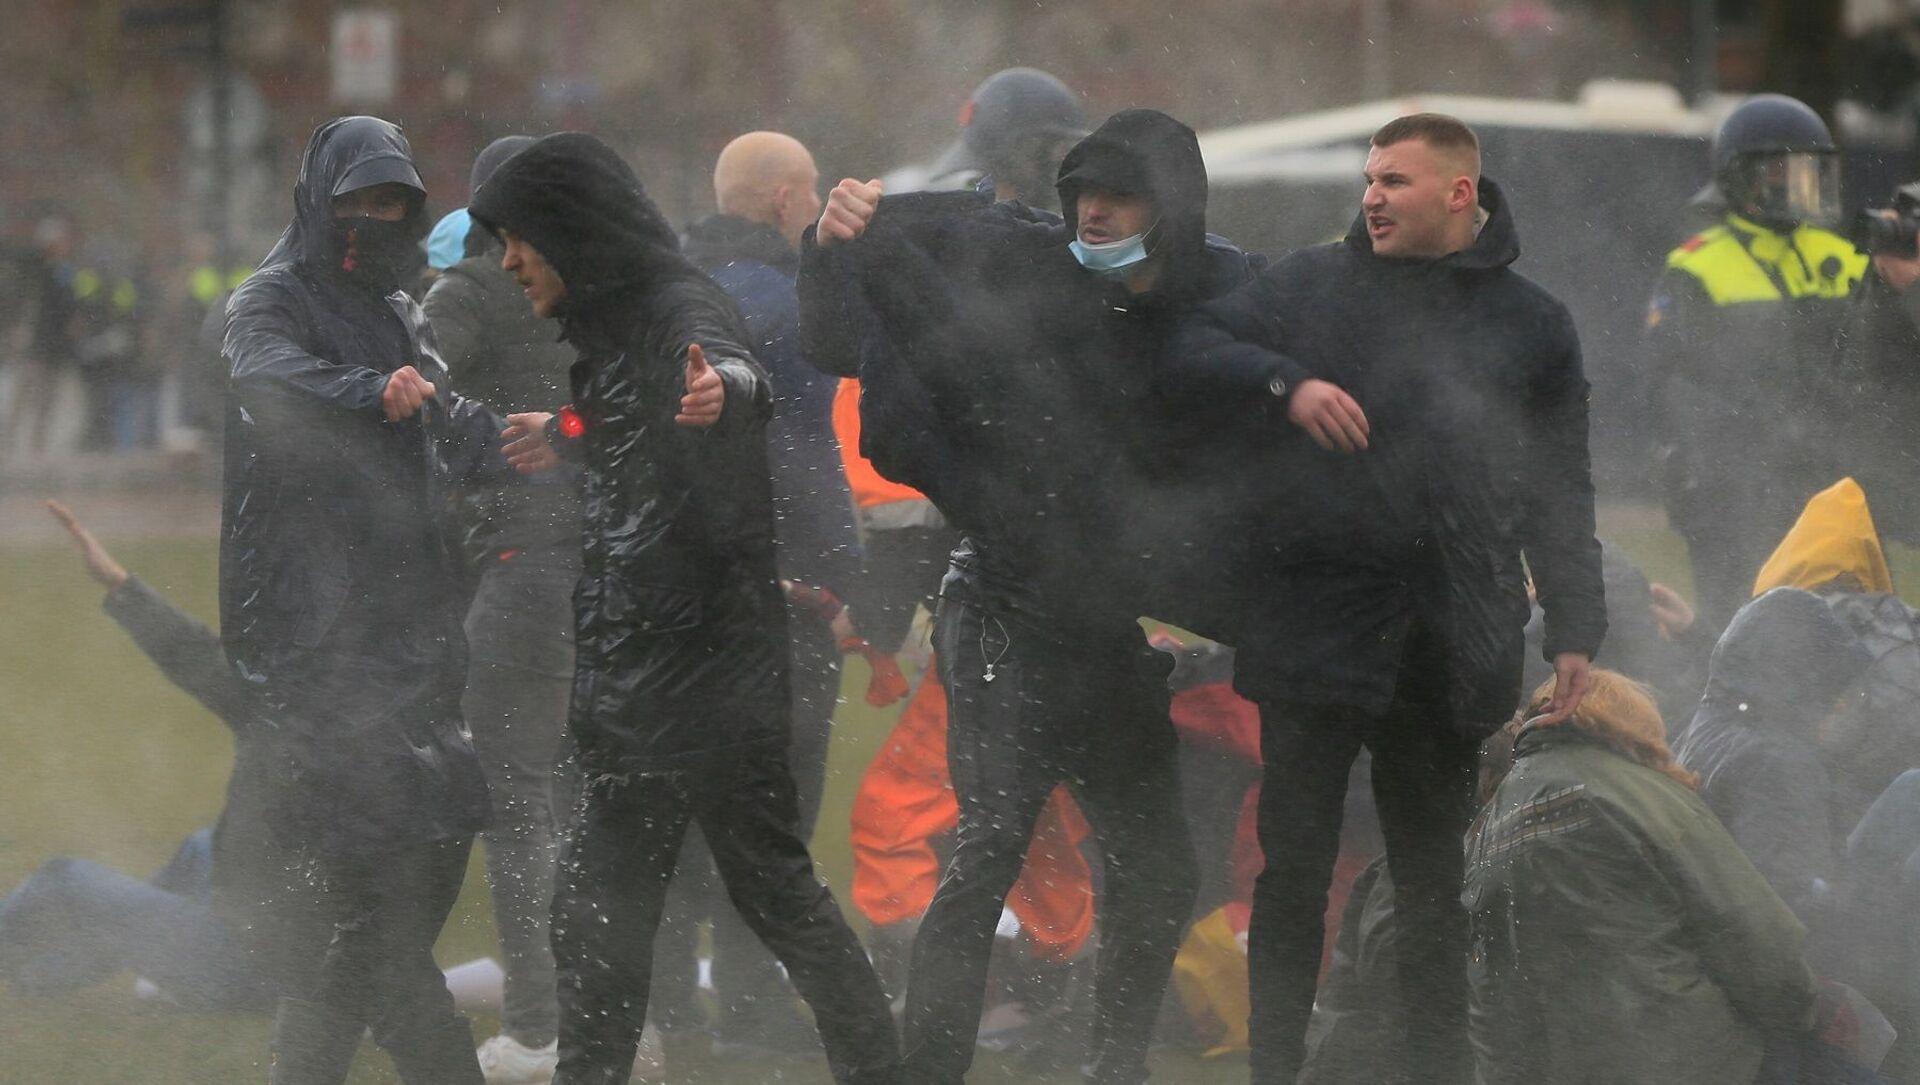 Hollanda - protesto - Sputnik Türkiye, 1920, 16.02.2021